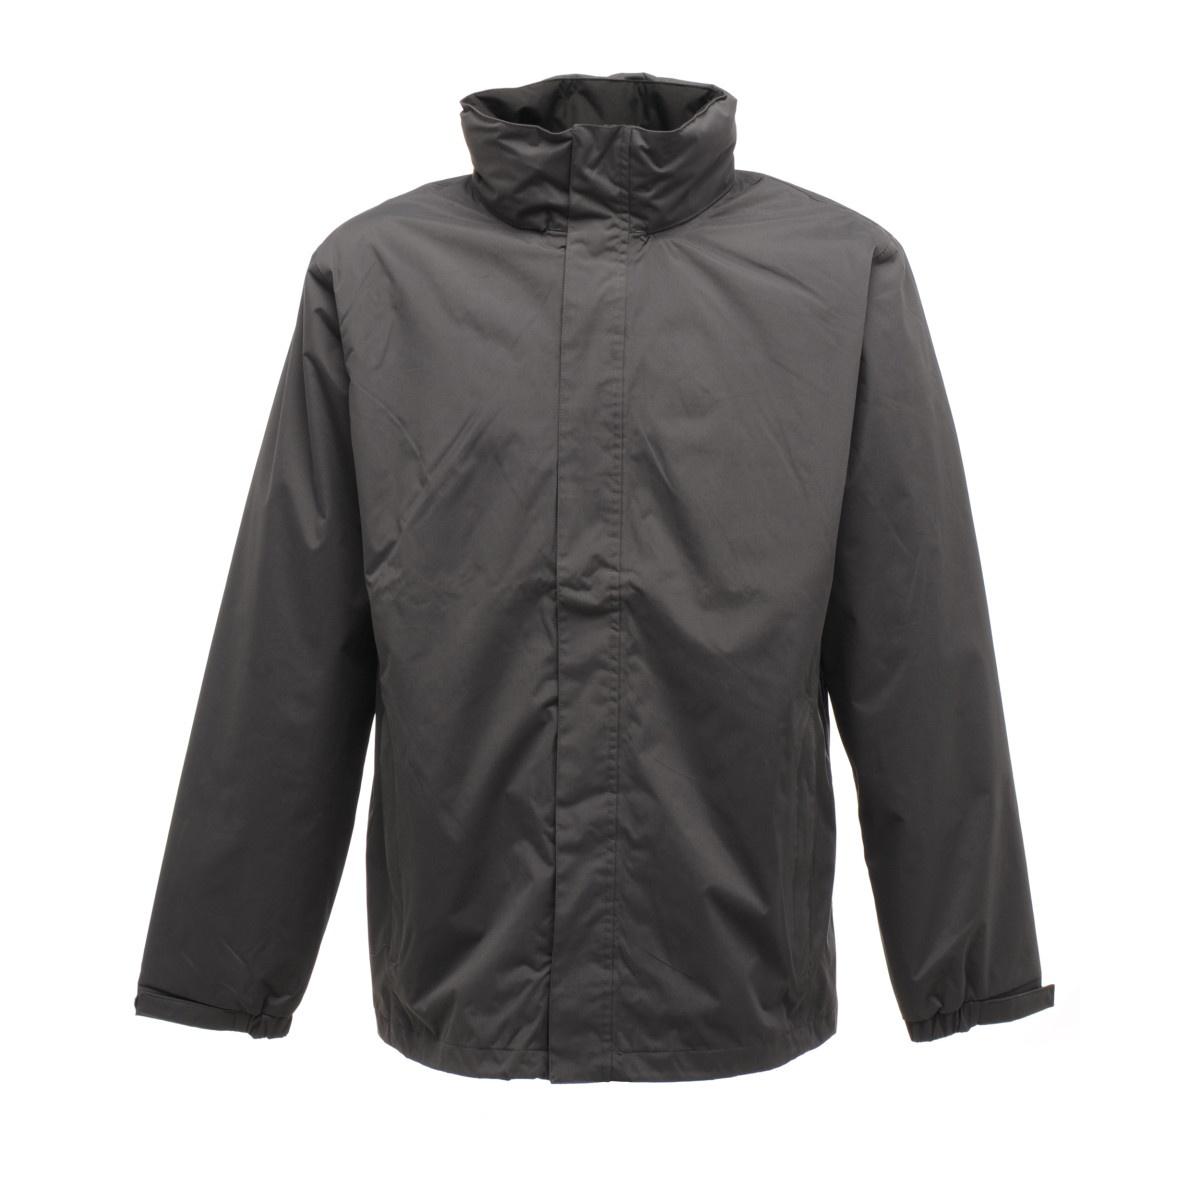 Regatta Mens Standout Ardmore Jacket (Waterproof & Windproof) (M) (Navy Blue)